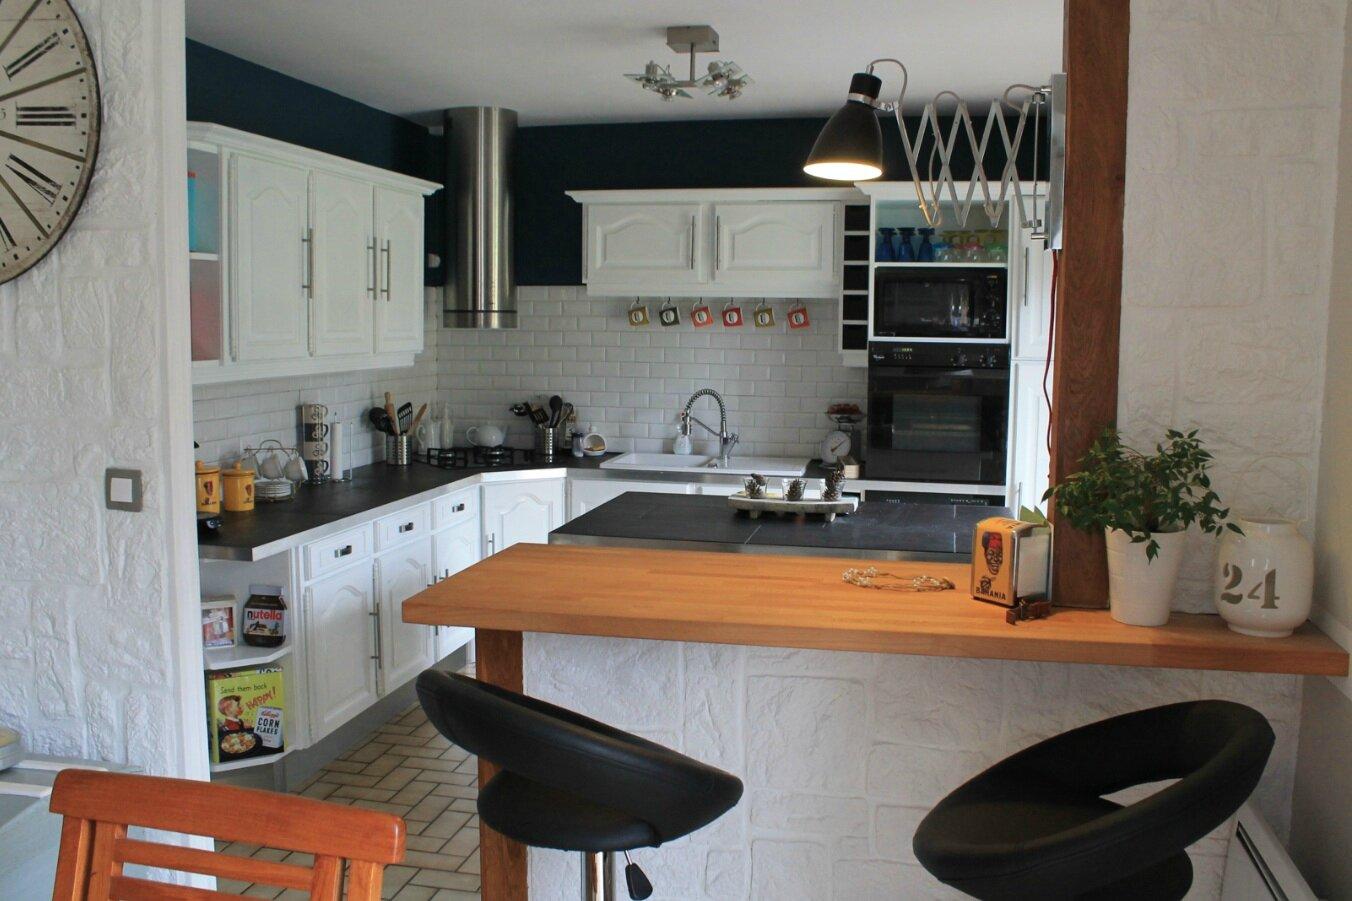 la cuisine avant apr s jules et oscar. Black Bedroom Furniture Sets. Home Design Ideas